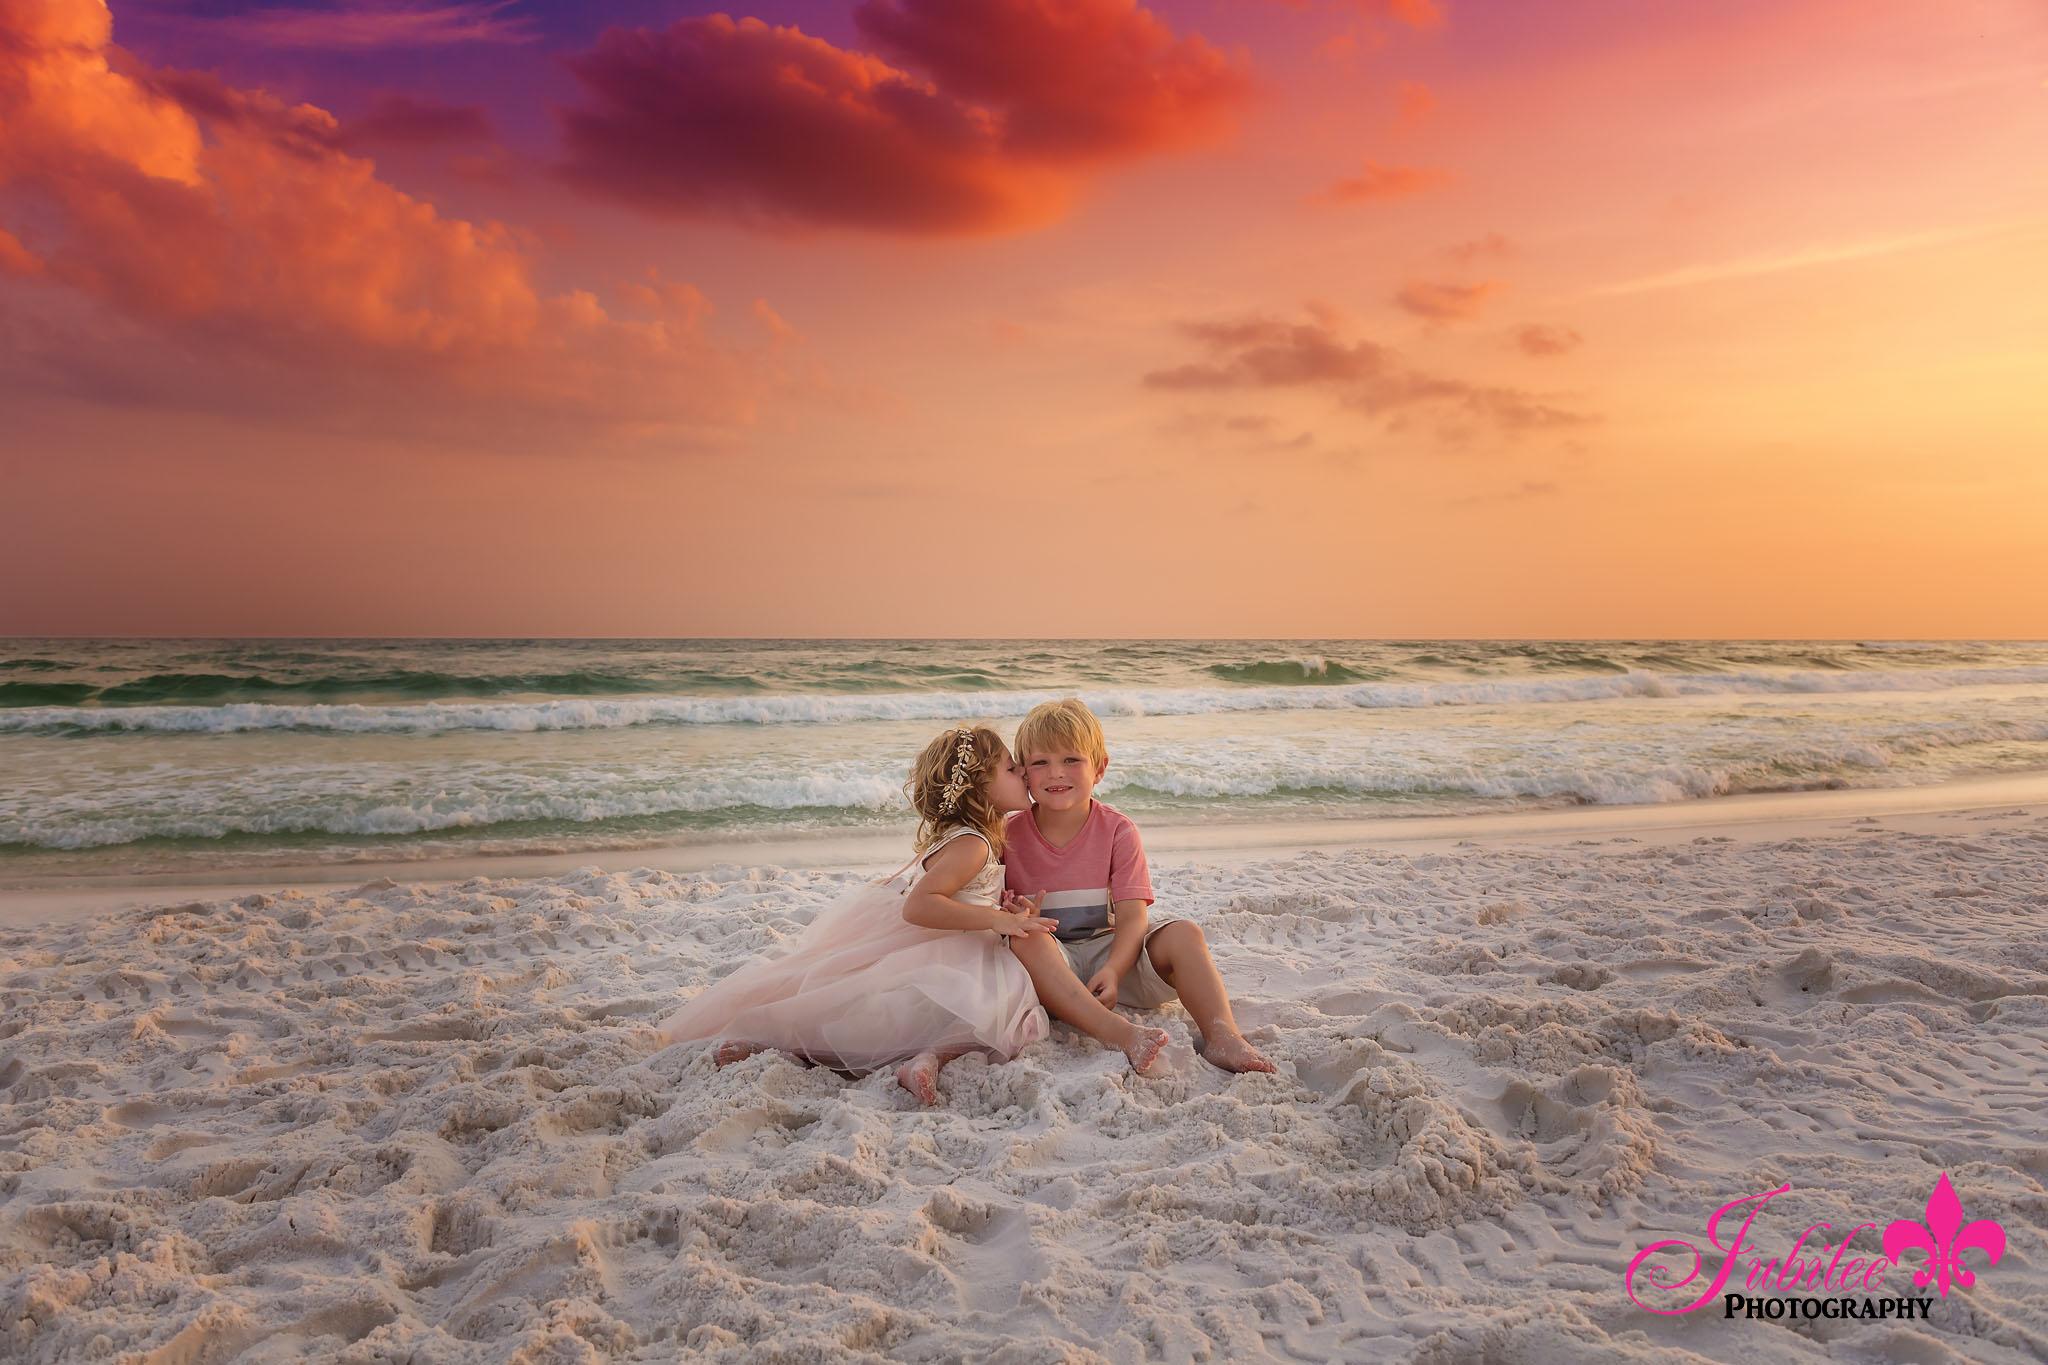 destin_beach_photographer_6195